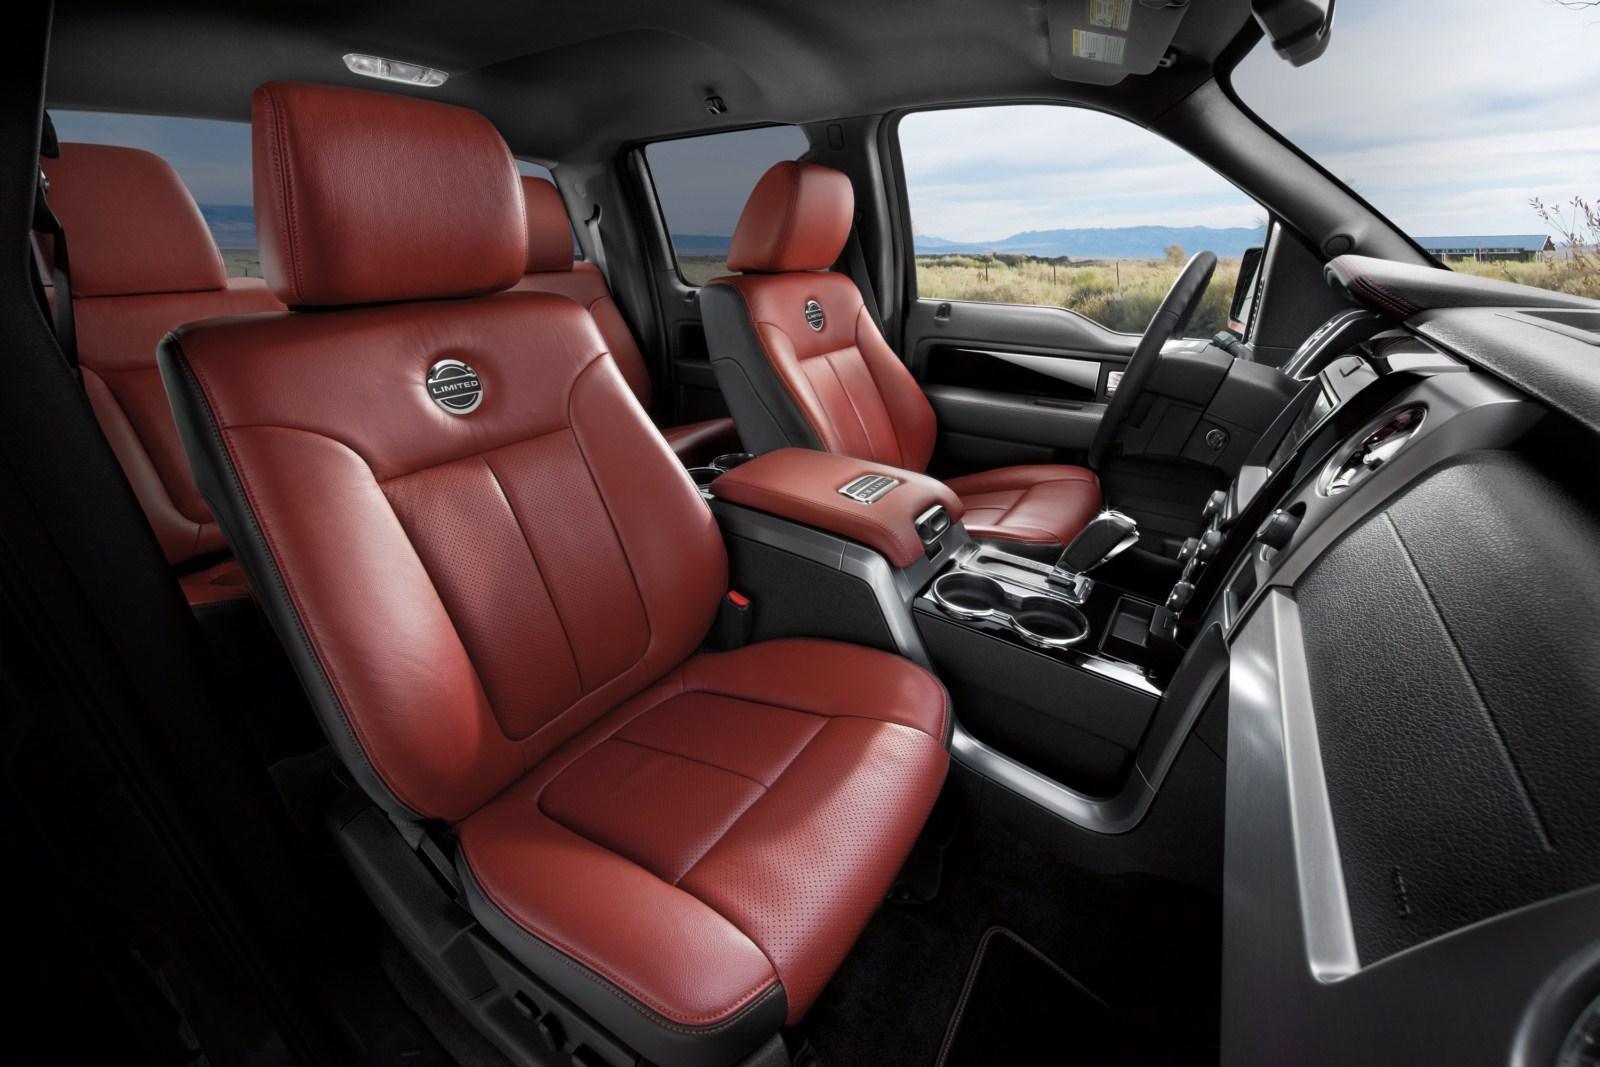 Ford f 150 svt raptor f 150 limited 2013 - 2013 ford f 150 interior accessories ...